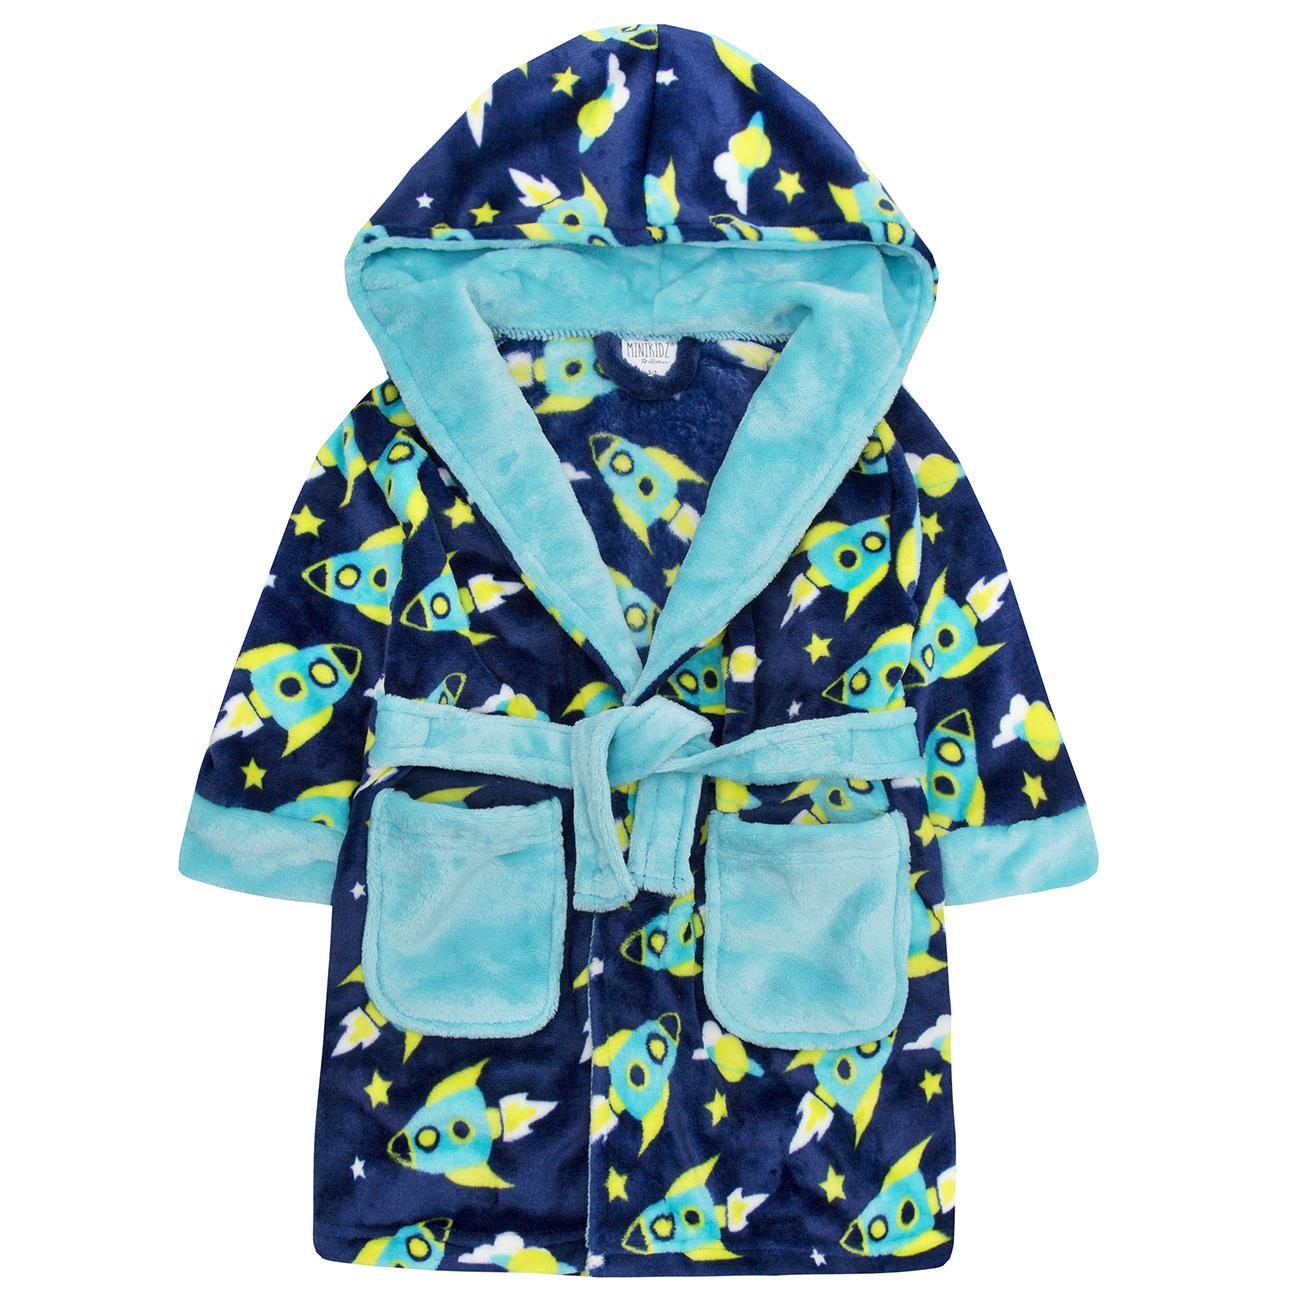 cb0ce2c5d34f Minikidz Infant Childs Boys Rocket Space Dressing Gown Hooded Fleece ...